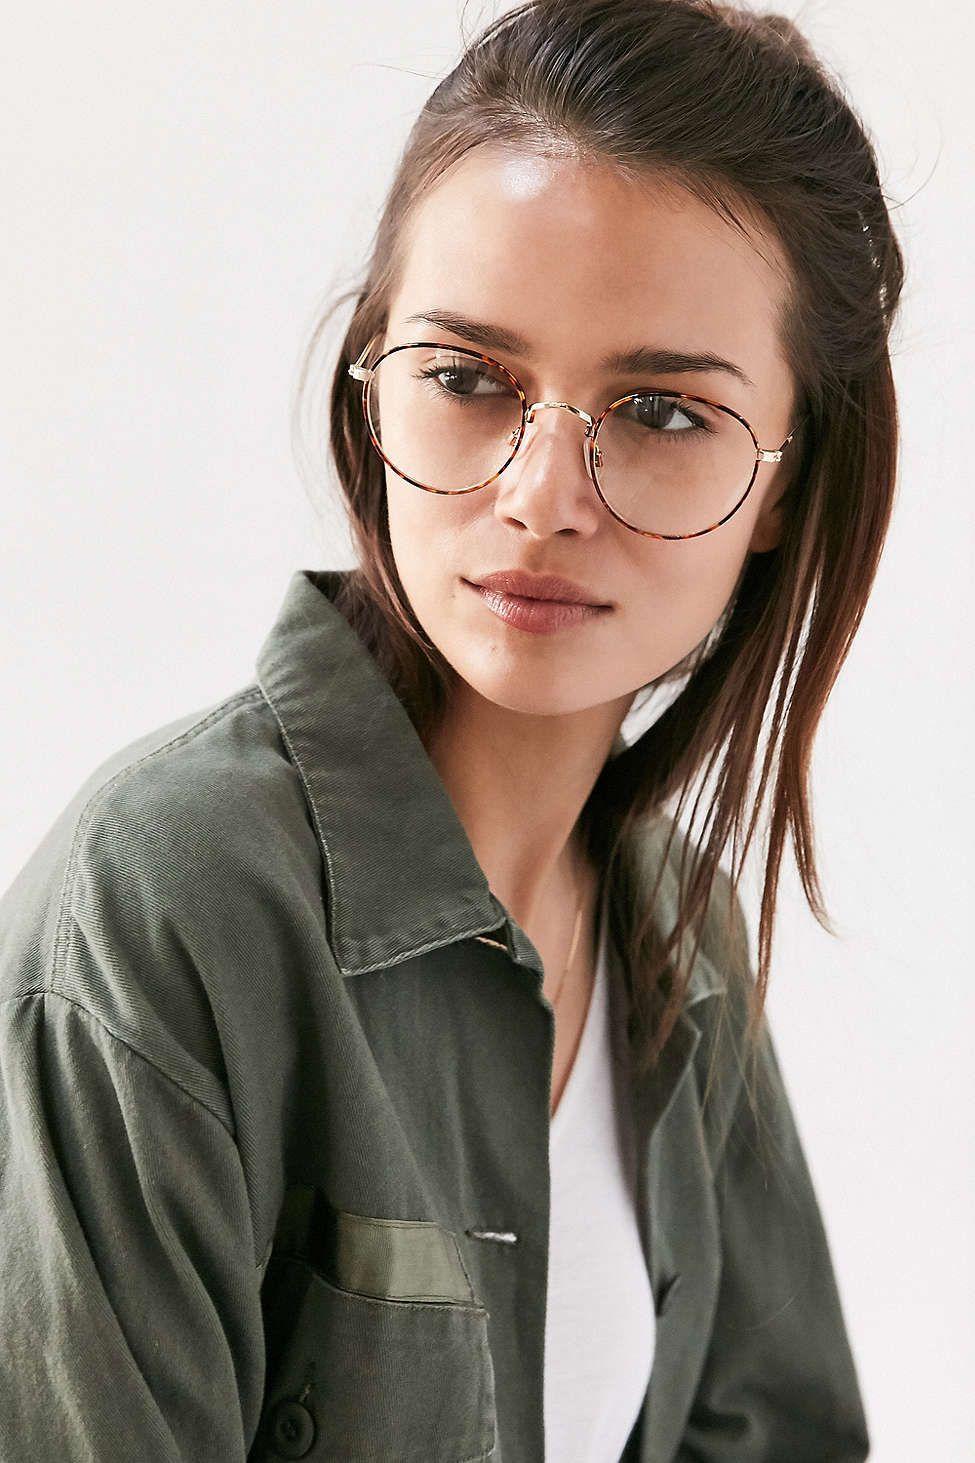 af097caa8e Lunettes rondes Kendall | 01_TODRESS | Choisir ses lunettes ...